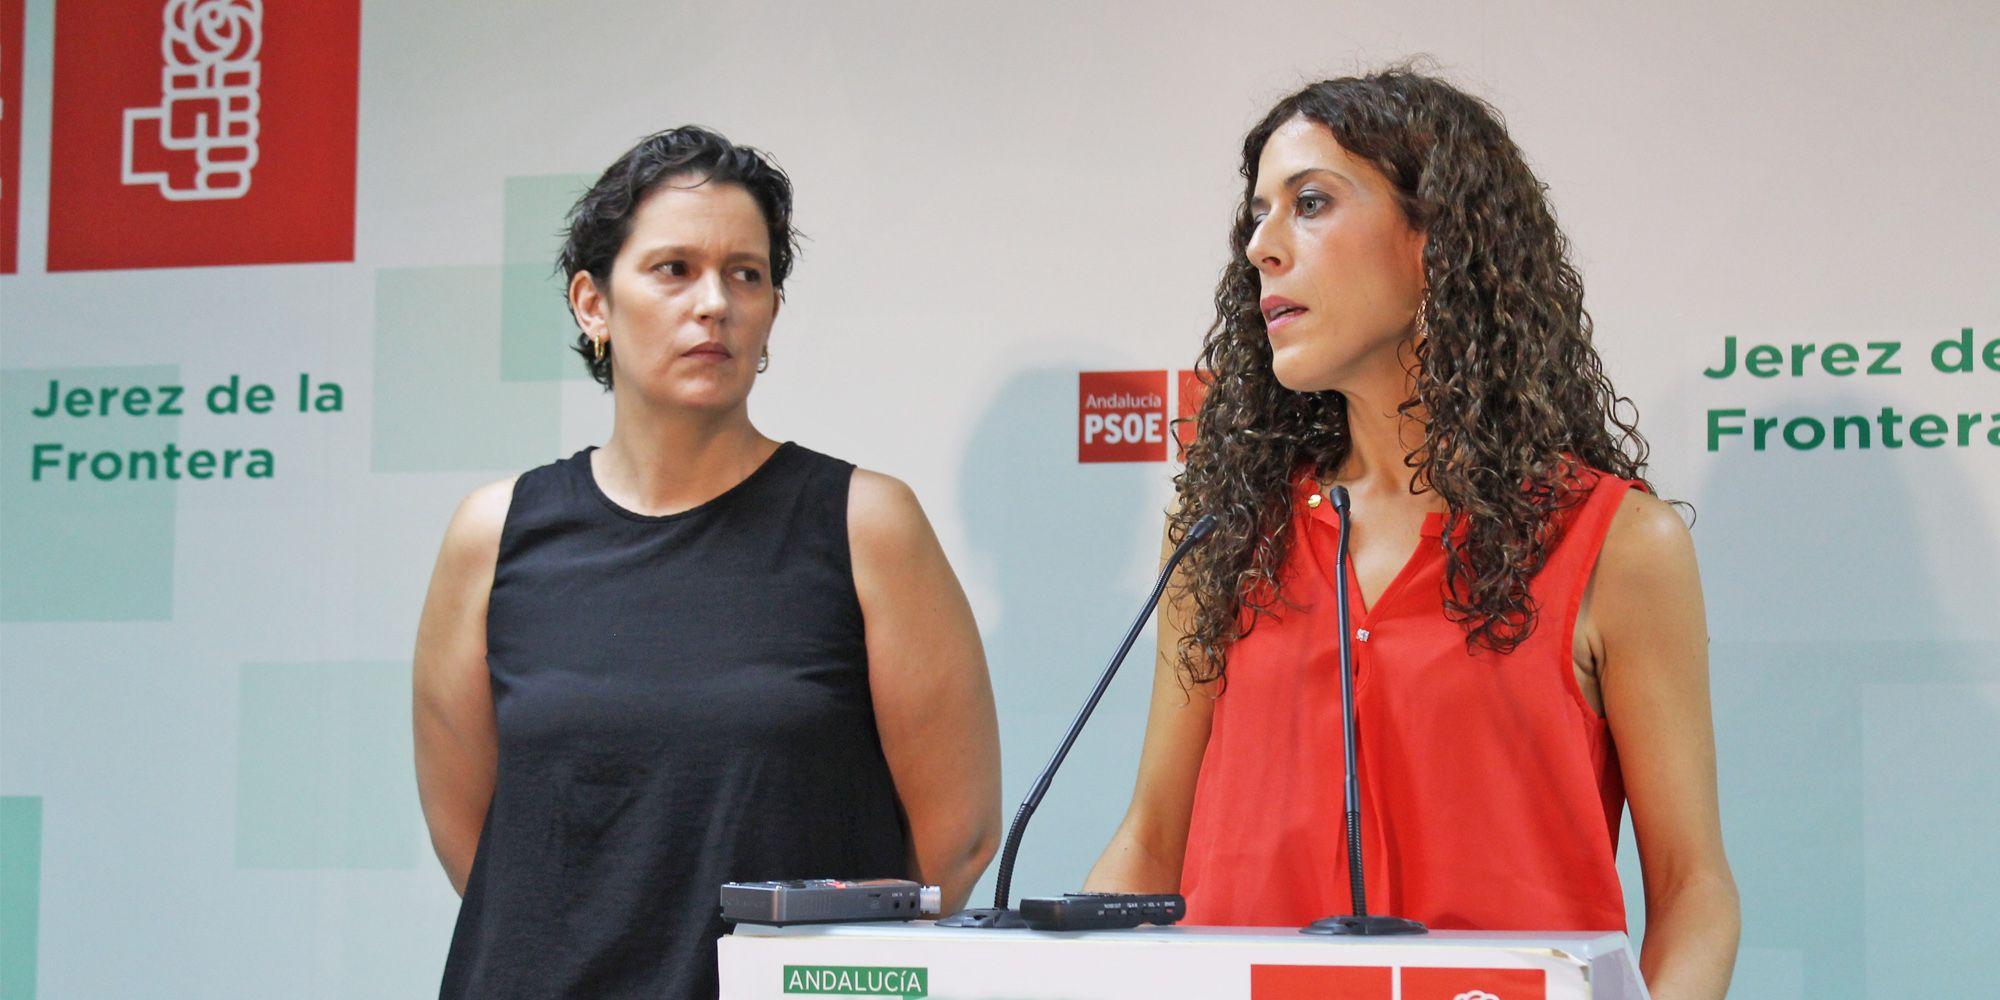 Miriam Alconchel Ainhoa Gil PSOE Jerez